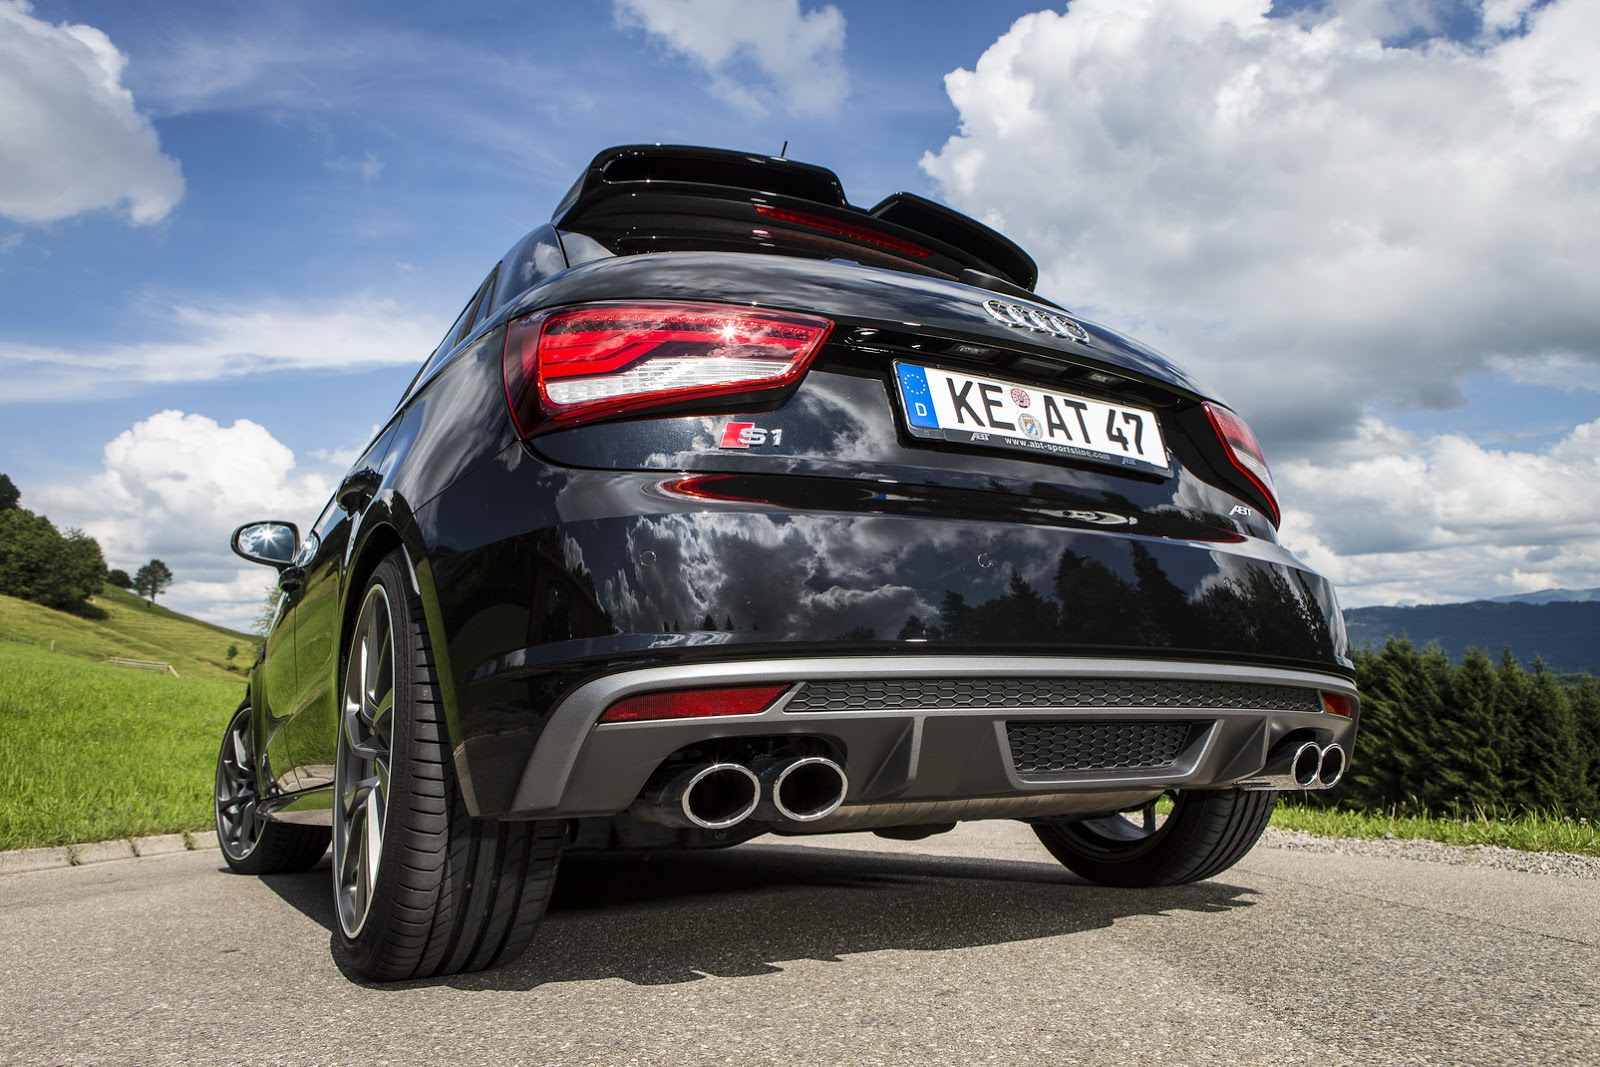 ABT S1 Audi 10 Audi S1 ABT – 310 cavalos de potência